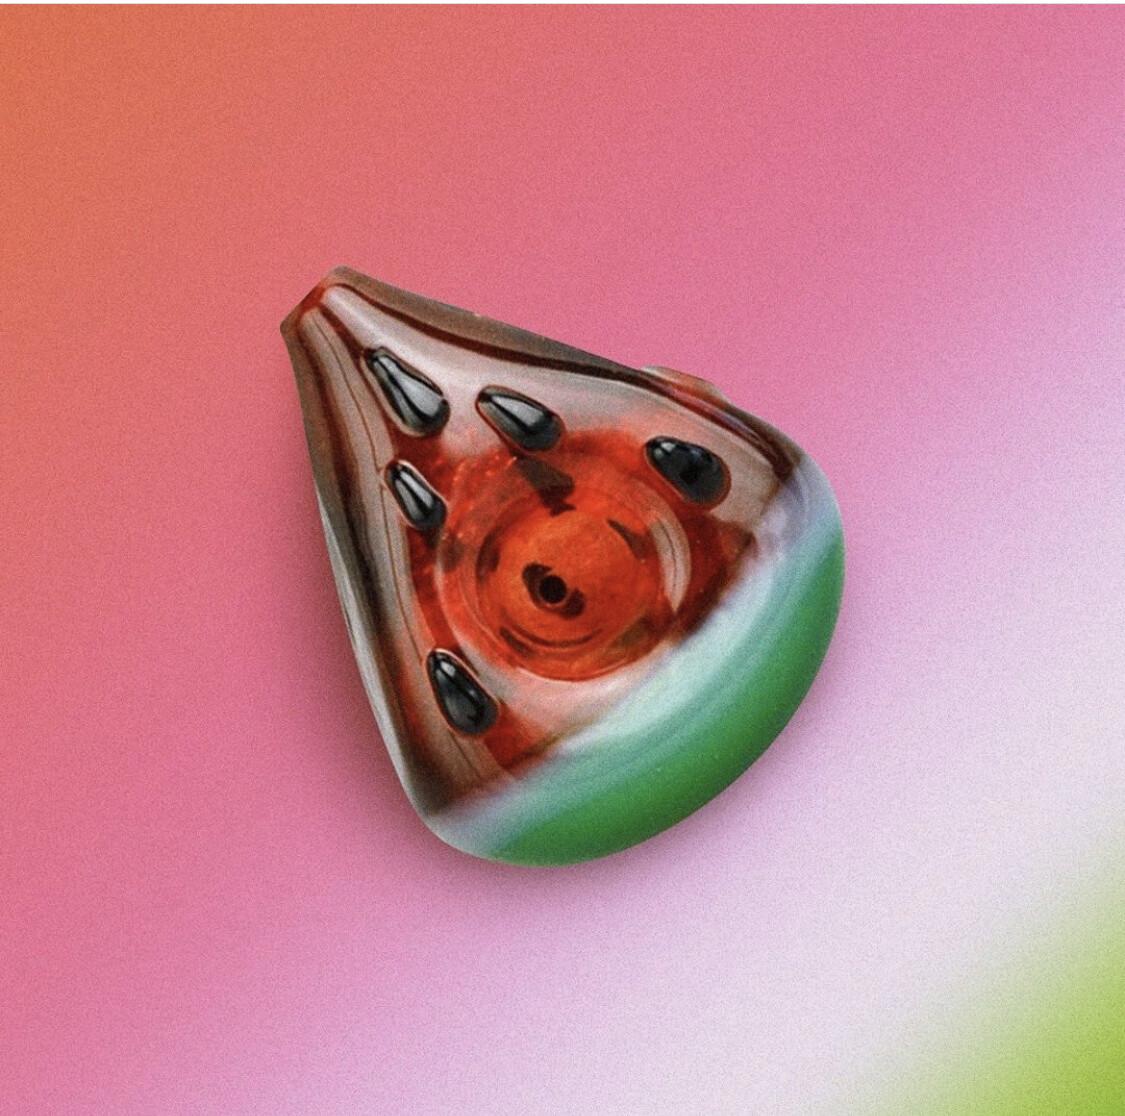 Watermelon Slice Hand Pipe